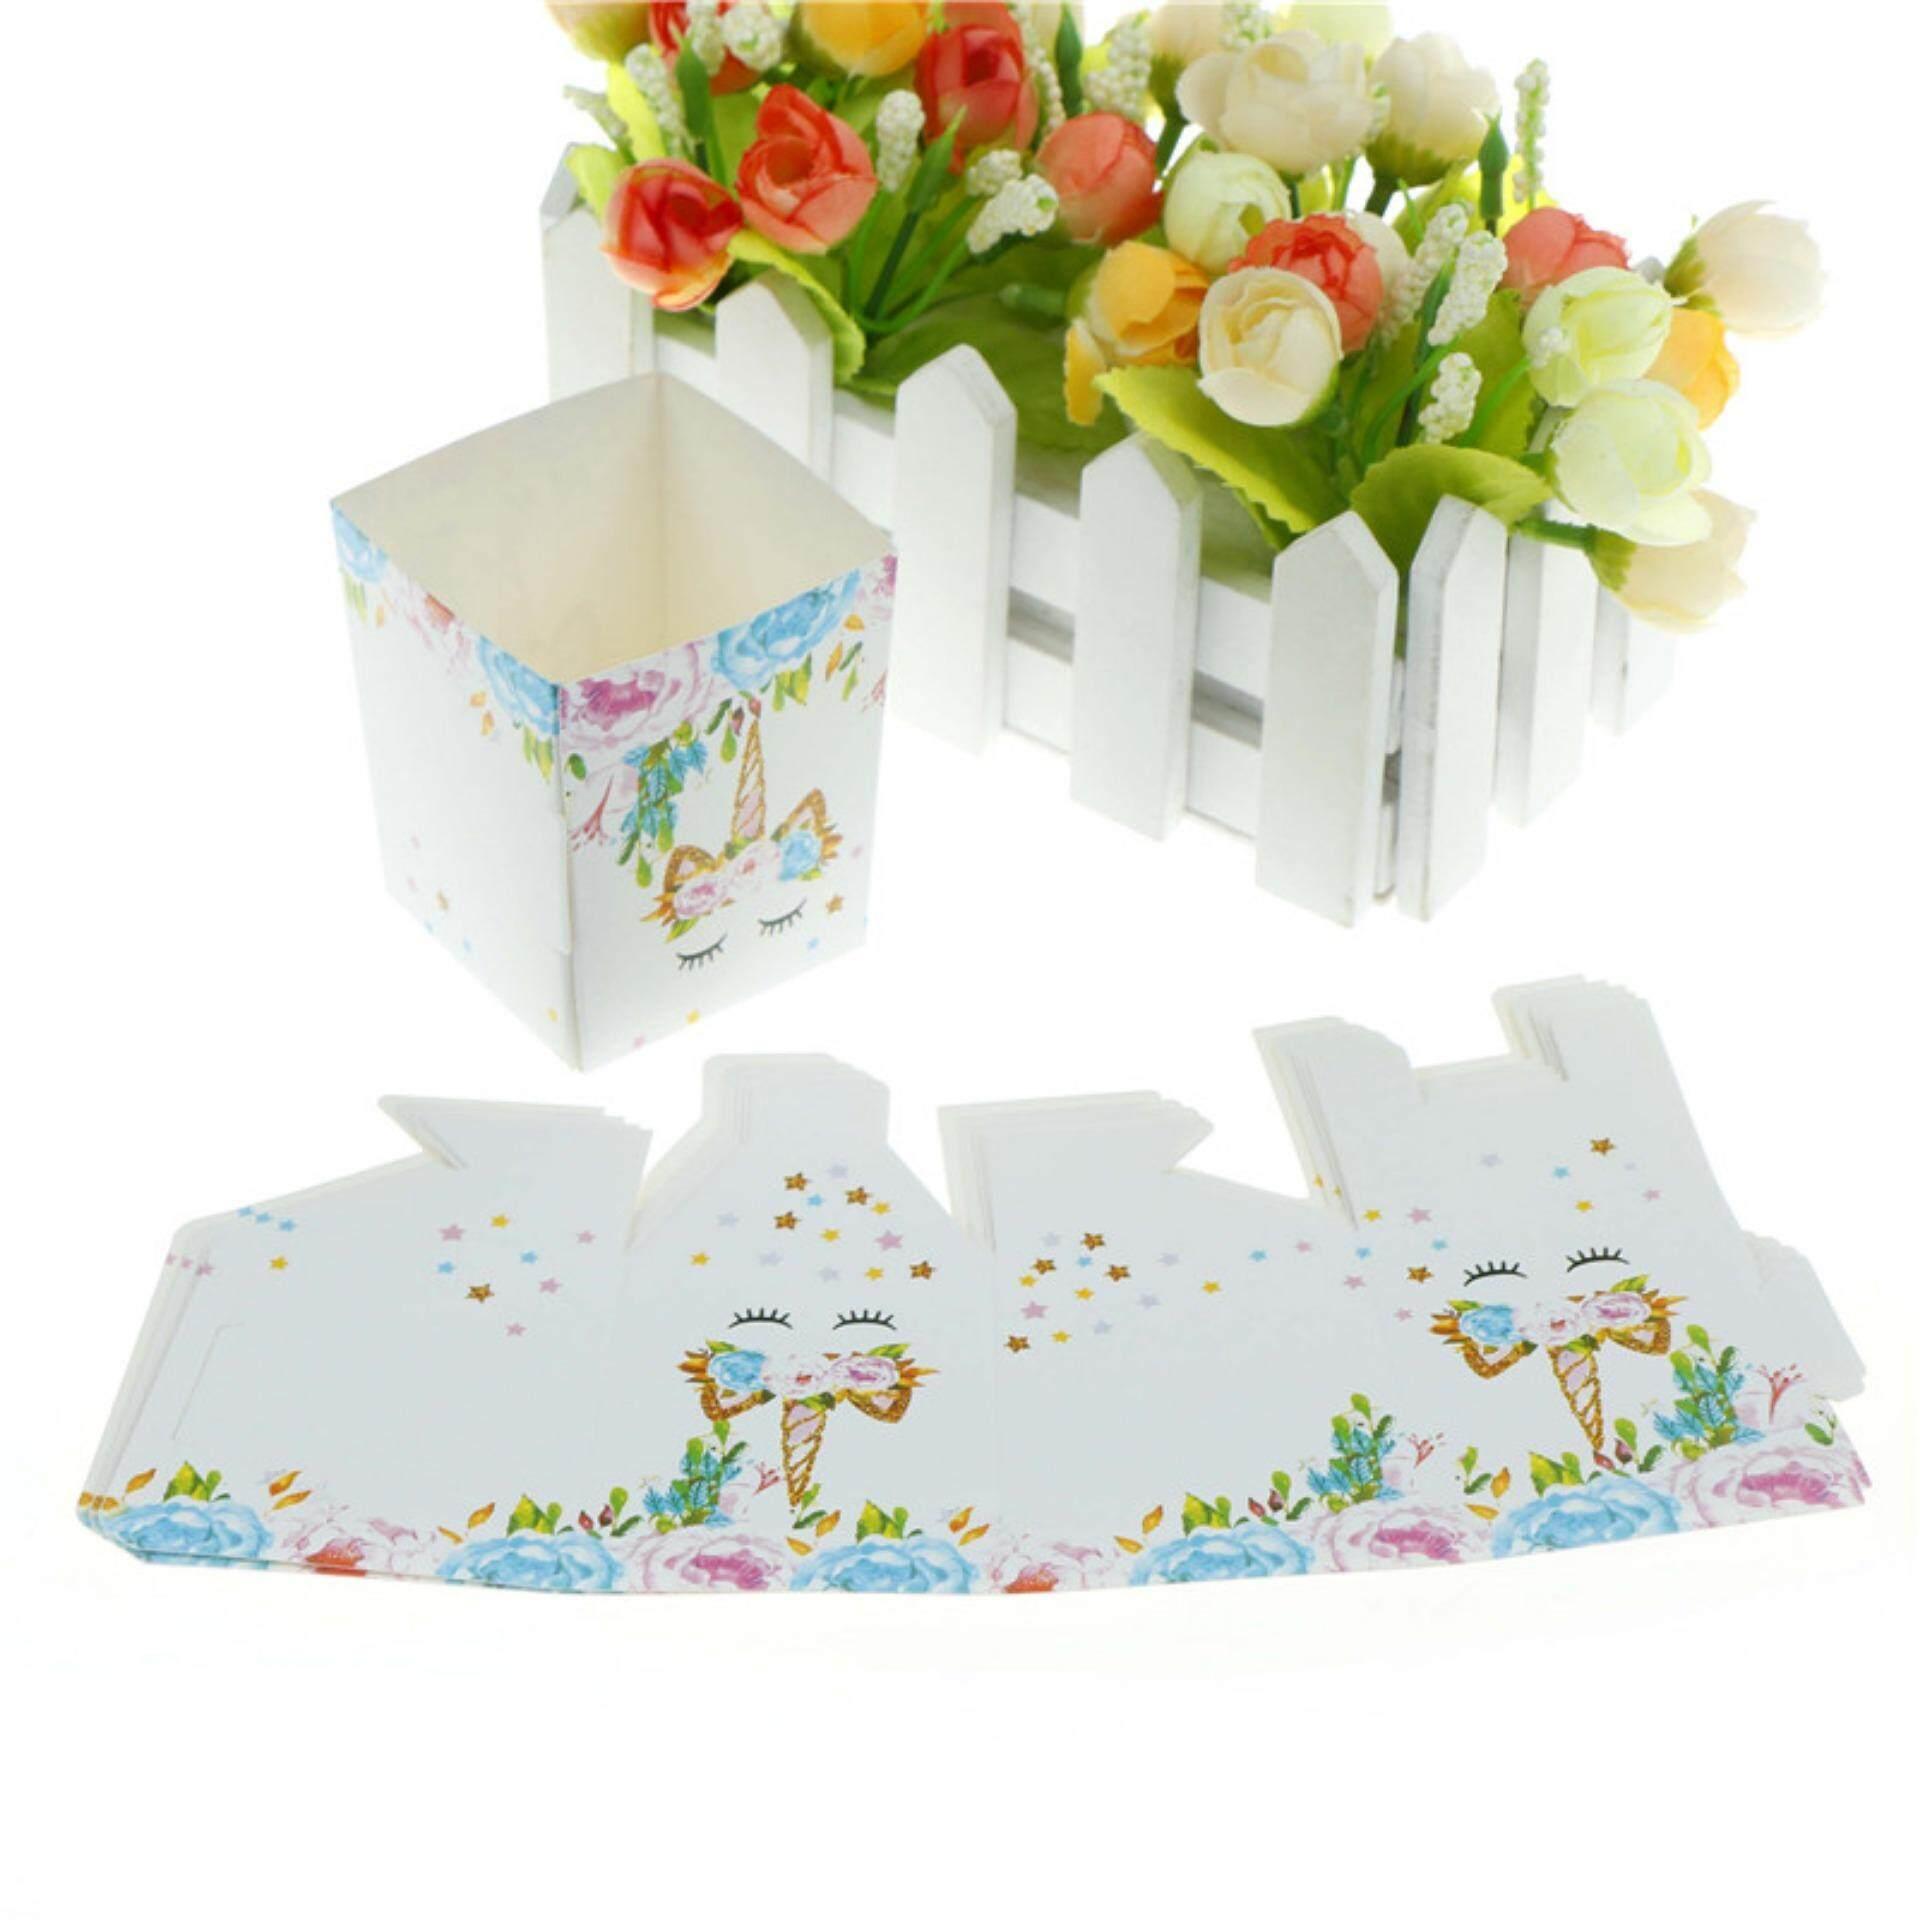 Beli sekarang 6pcs Unicorn Popcorn Box Gift Candy Boxes for Kids Happy  Birthday Party Decor terbaik murah - Hanya Rp35.529 b46d3f63fb